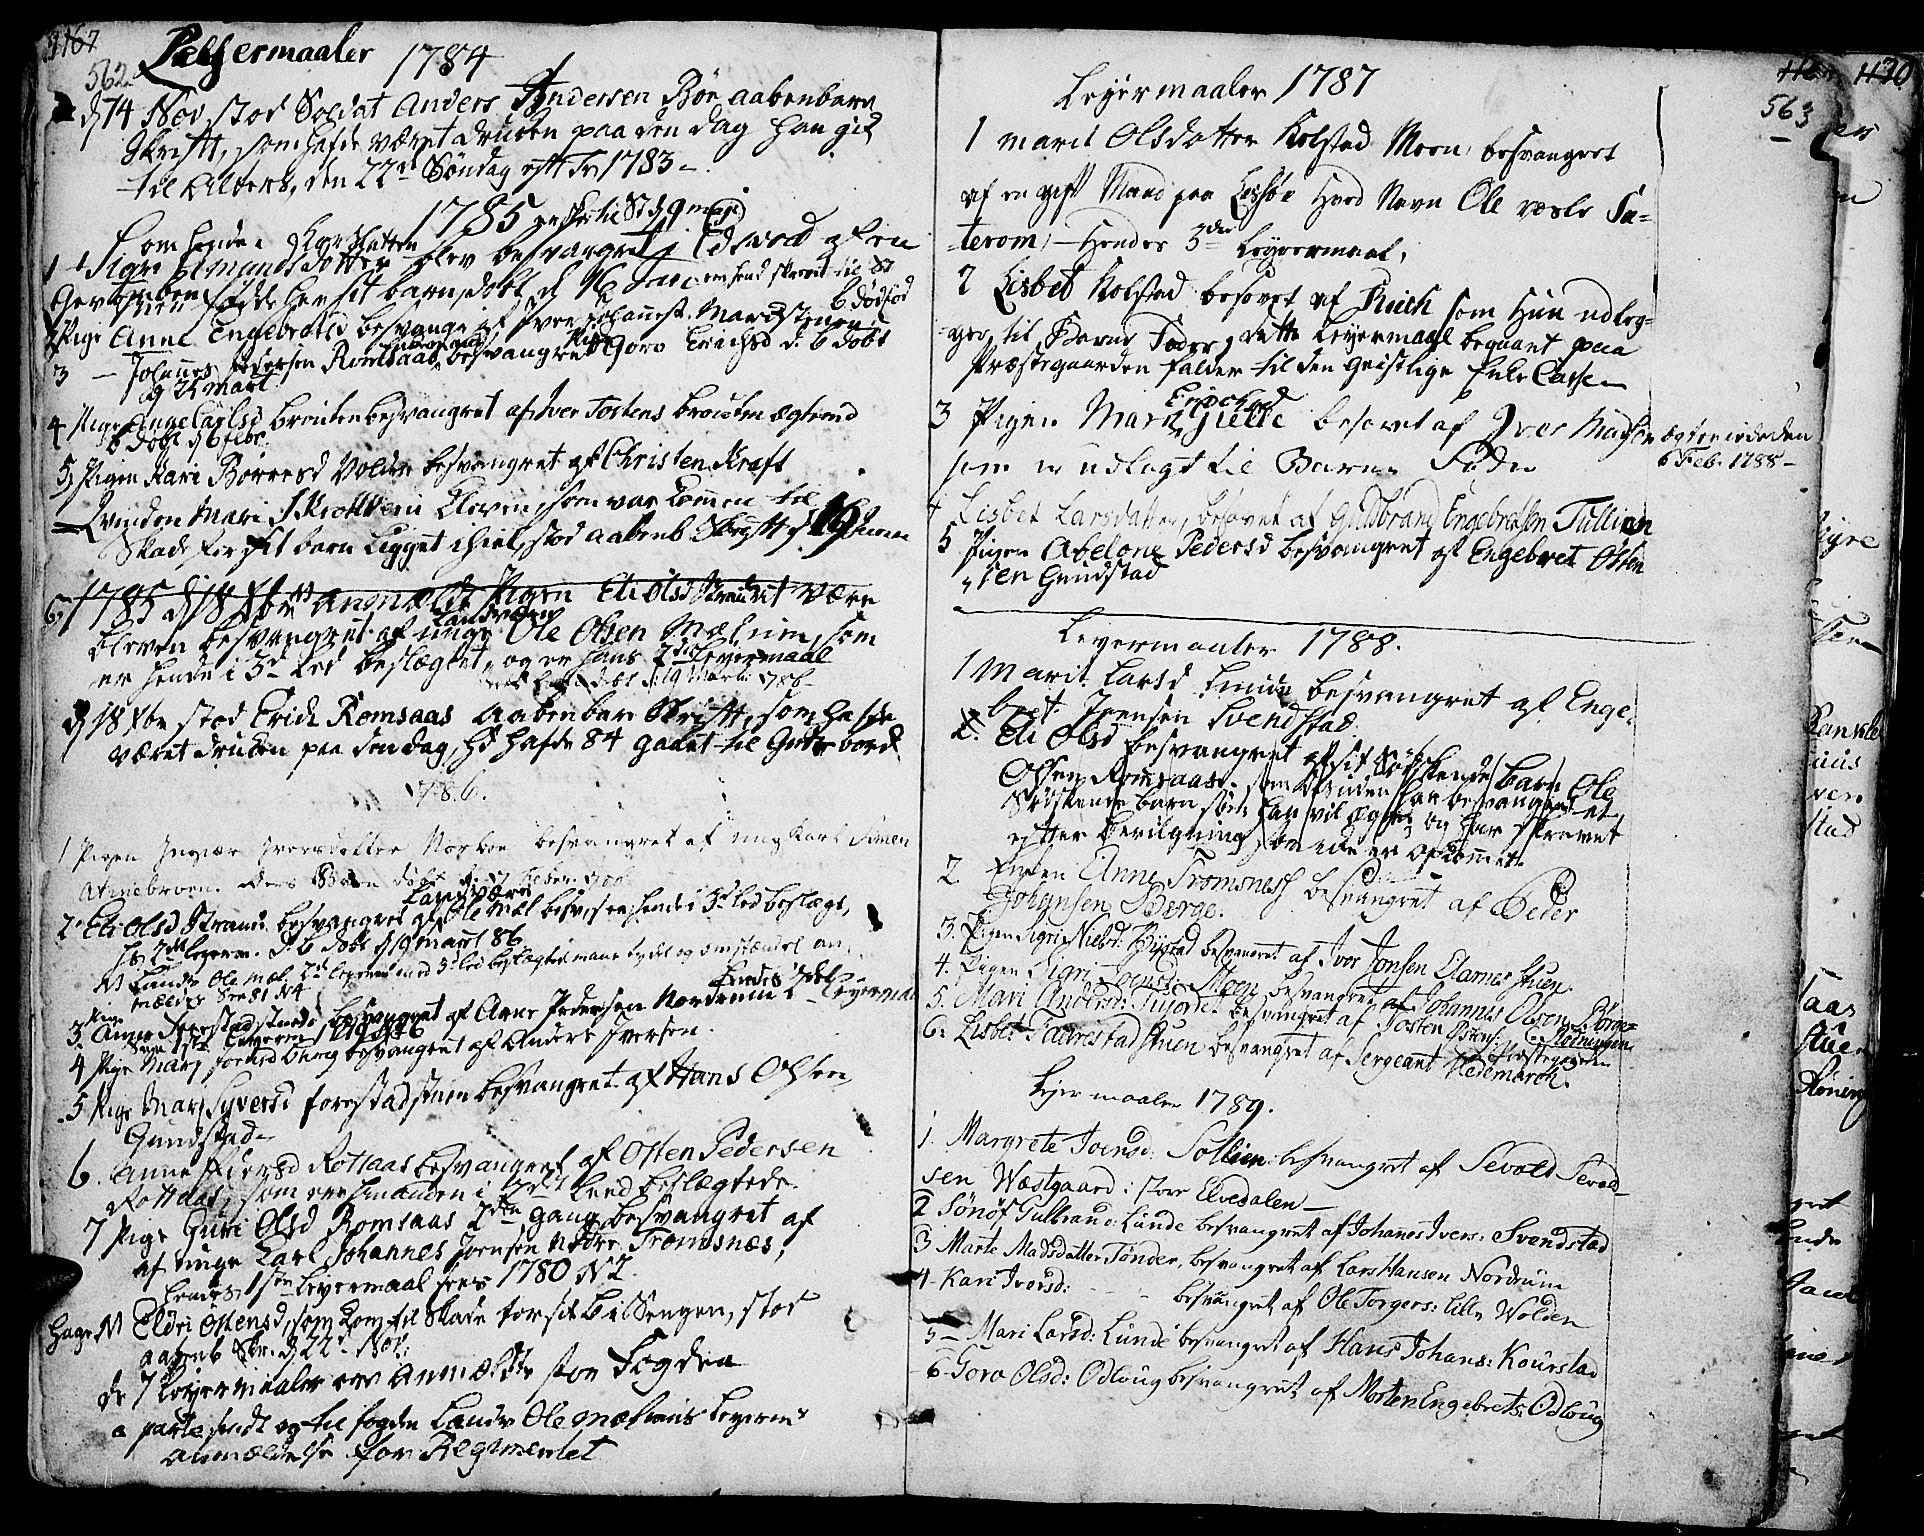 SAH, Ringebu prestekontor, Ministerialbok nr. 3, 1781-1820, s. 562-563